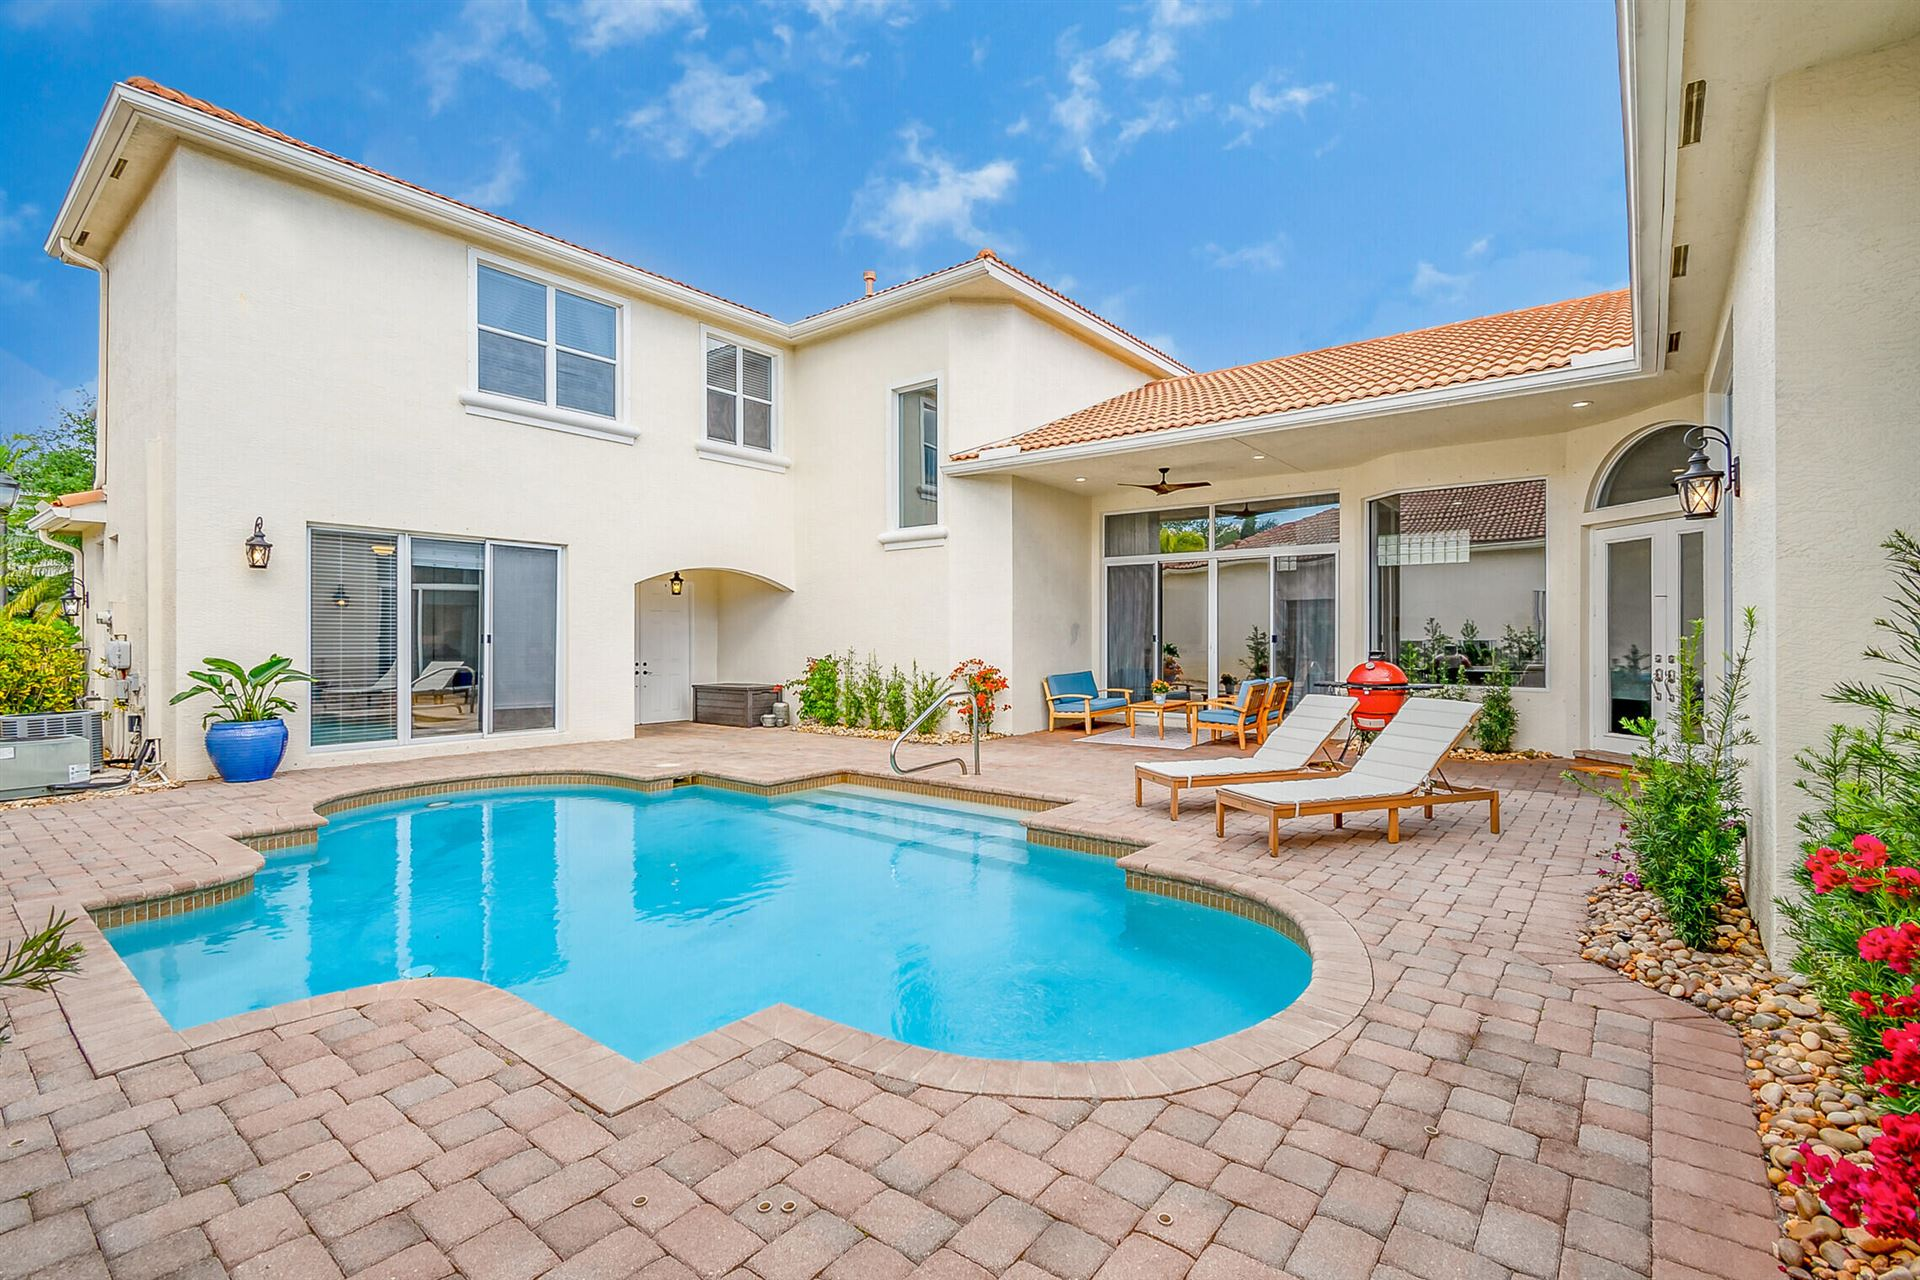 Photo of 214 Sedona Way, Palm Beach Gardens, FL 33418 (MLS # RX-10708833)